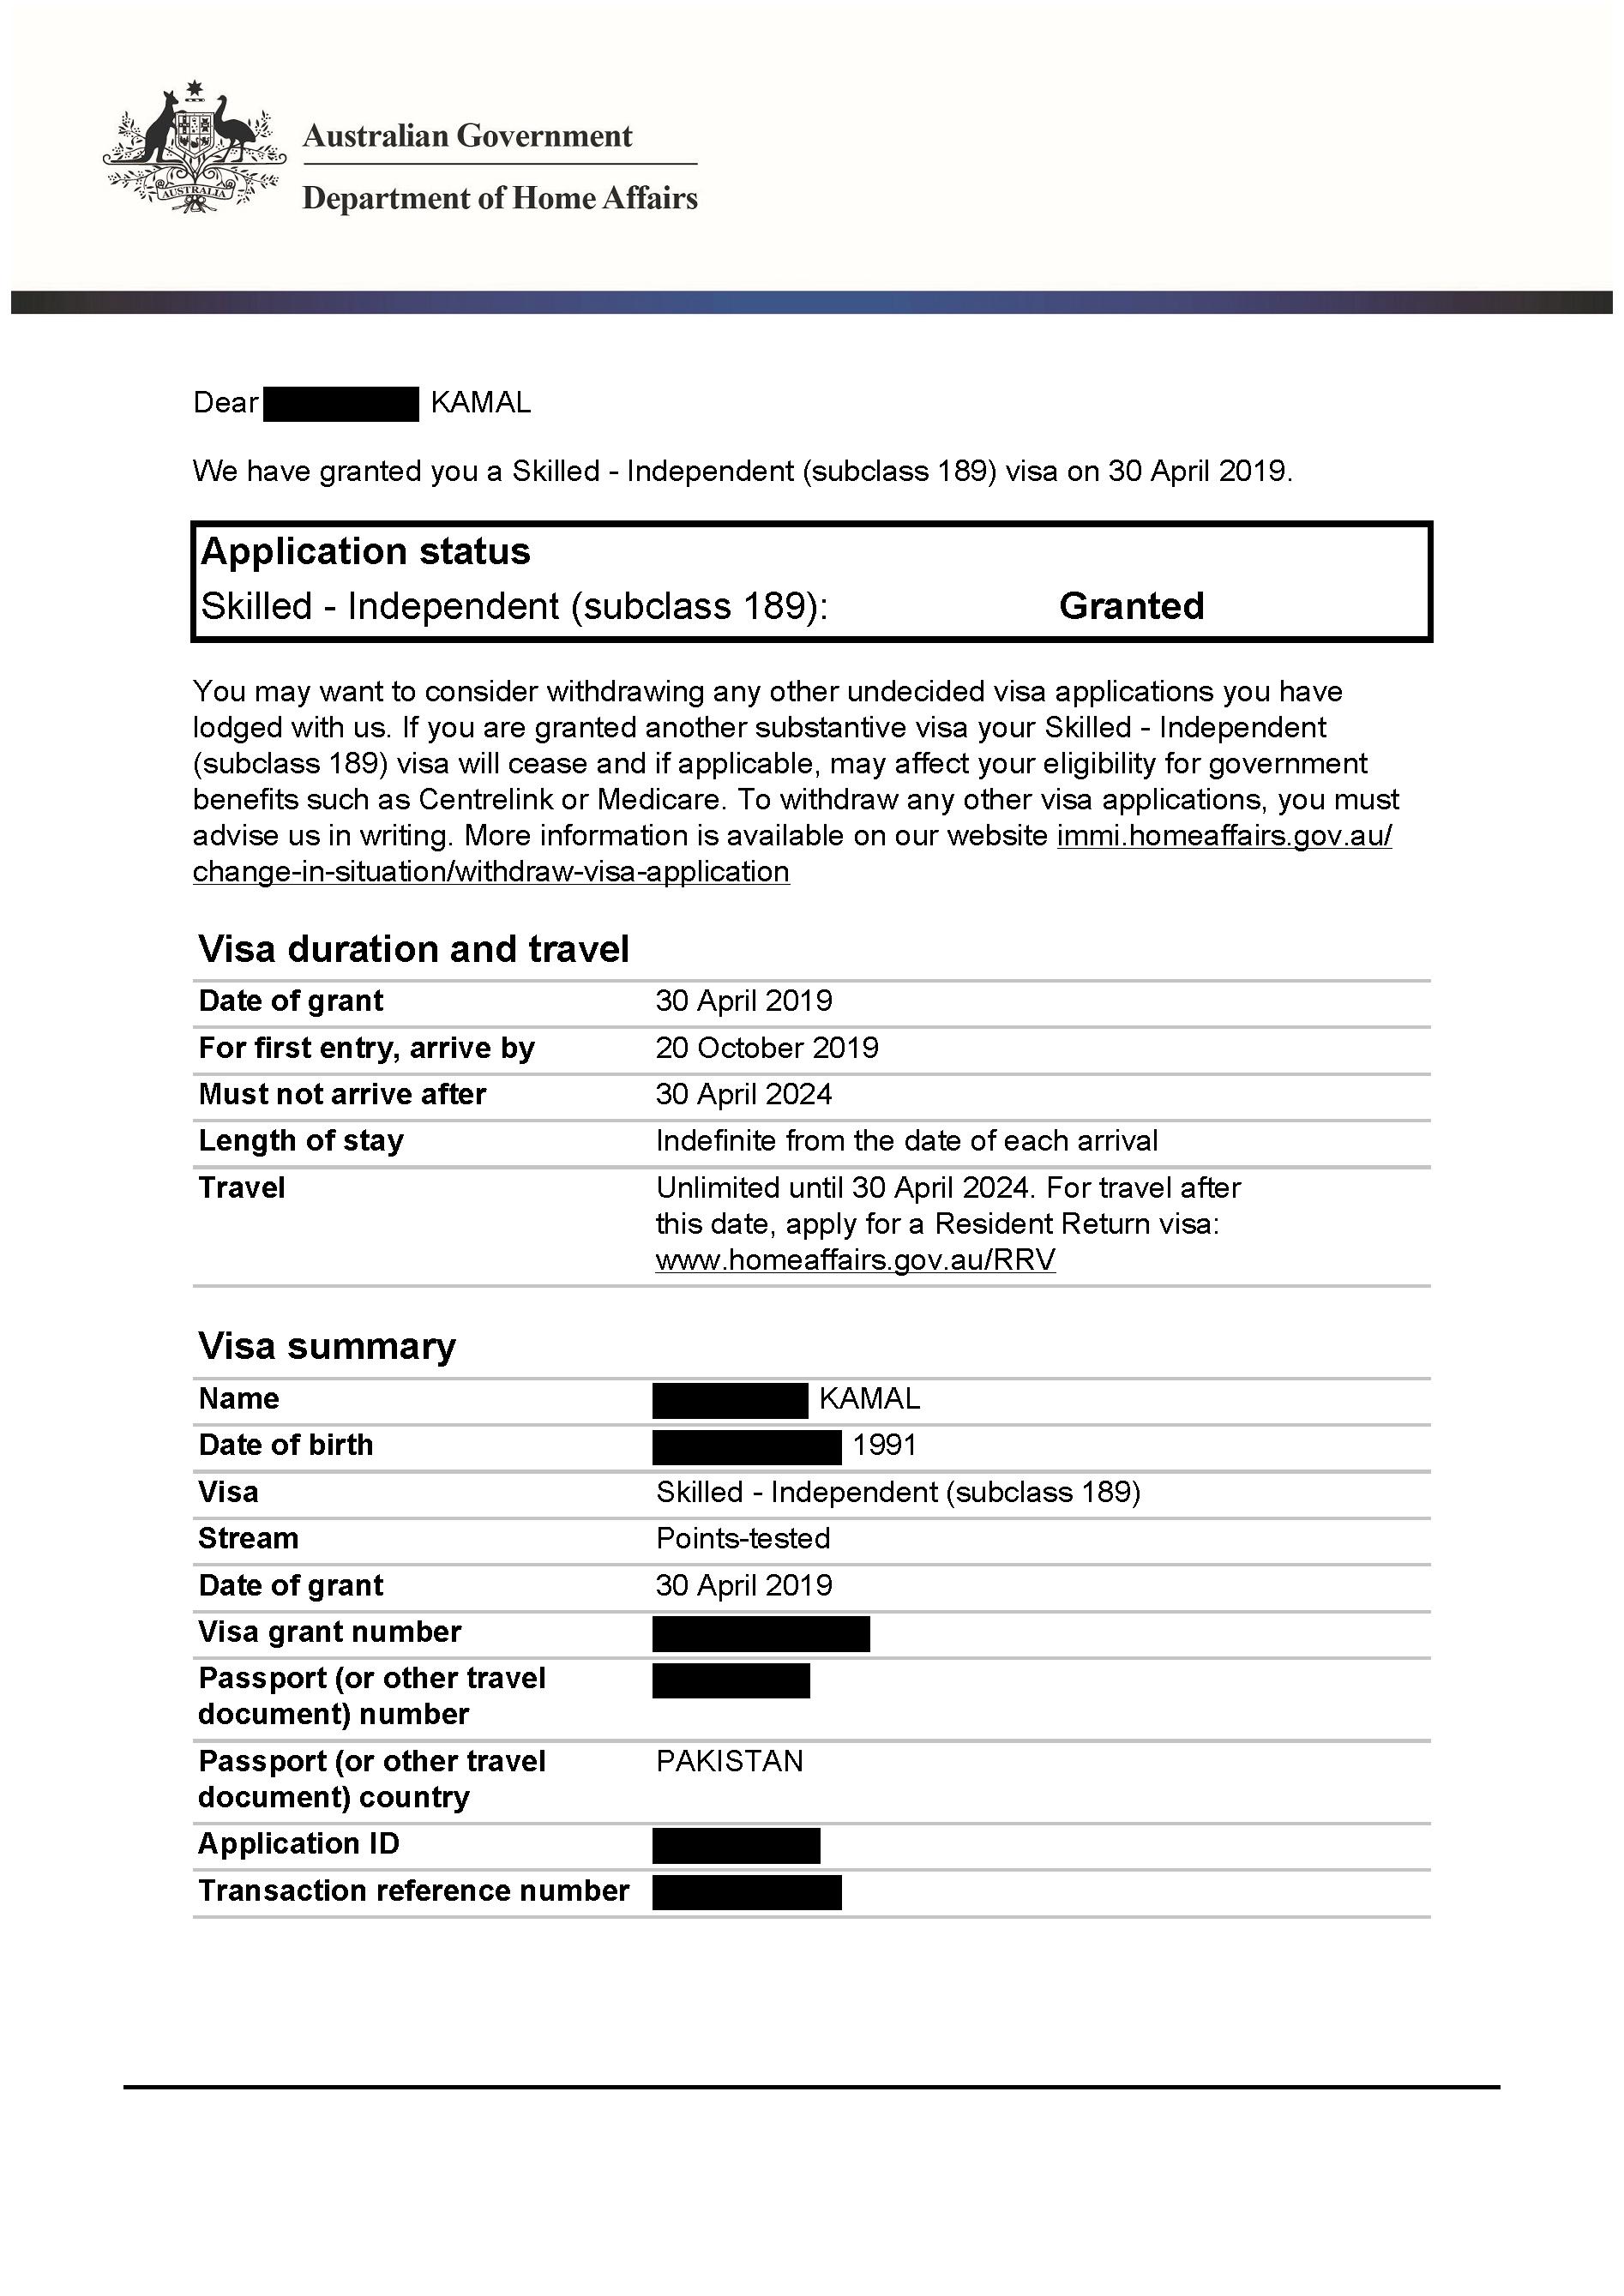 IMMI Grant Notification – 189 Kamal_Redacted